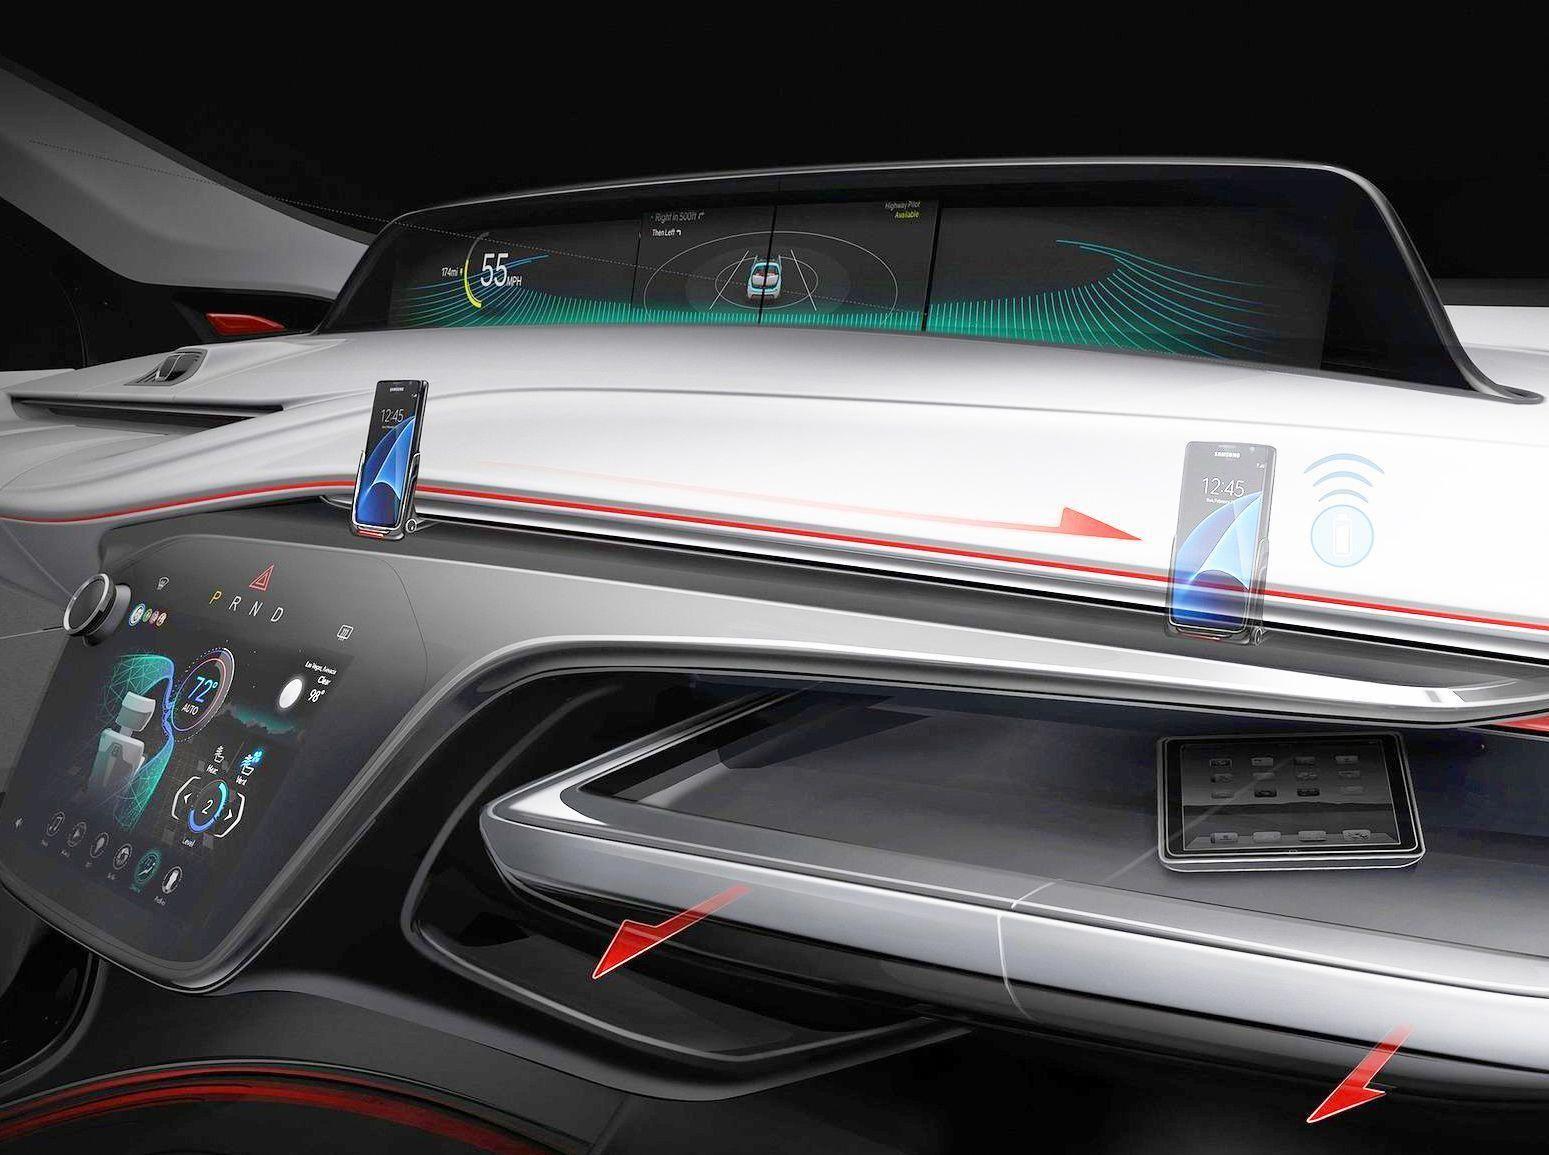 Interiordesignschools With Images Car Interior Design Sketch